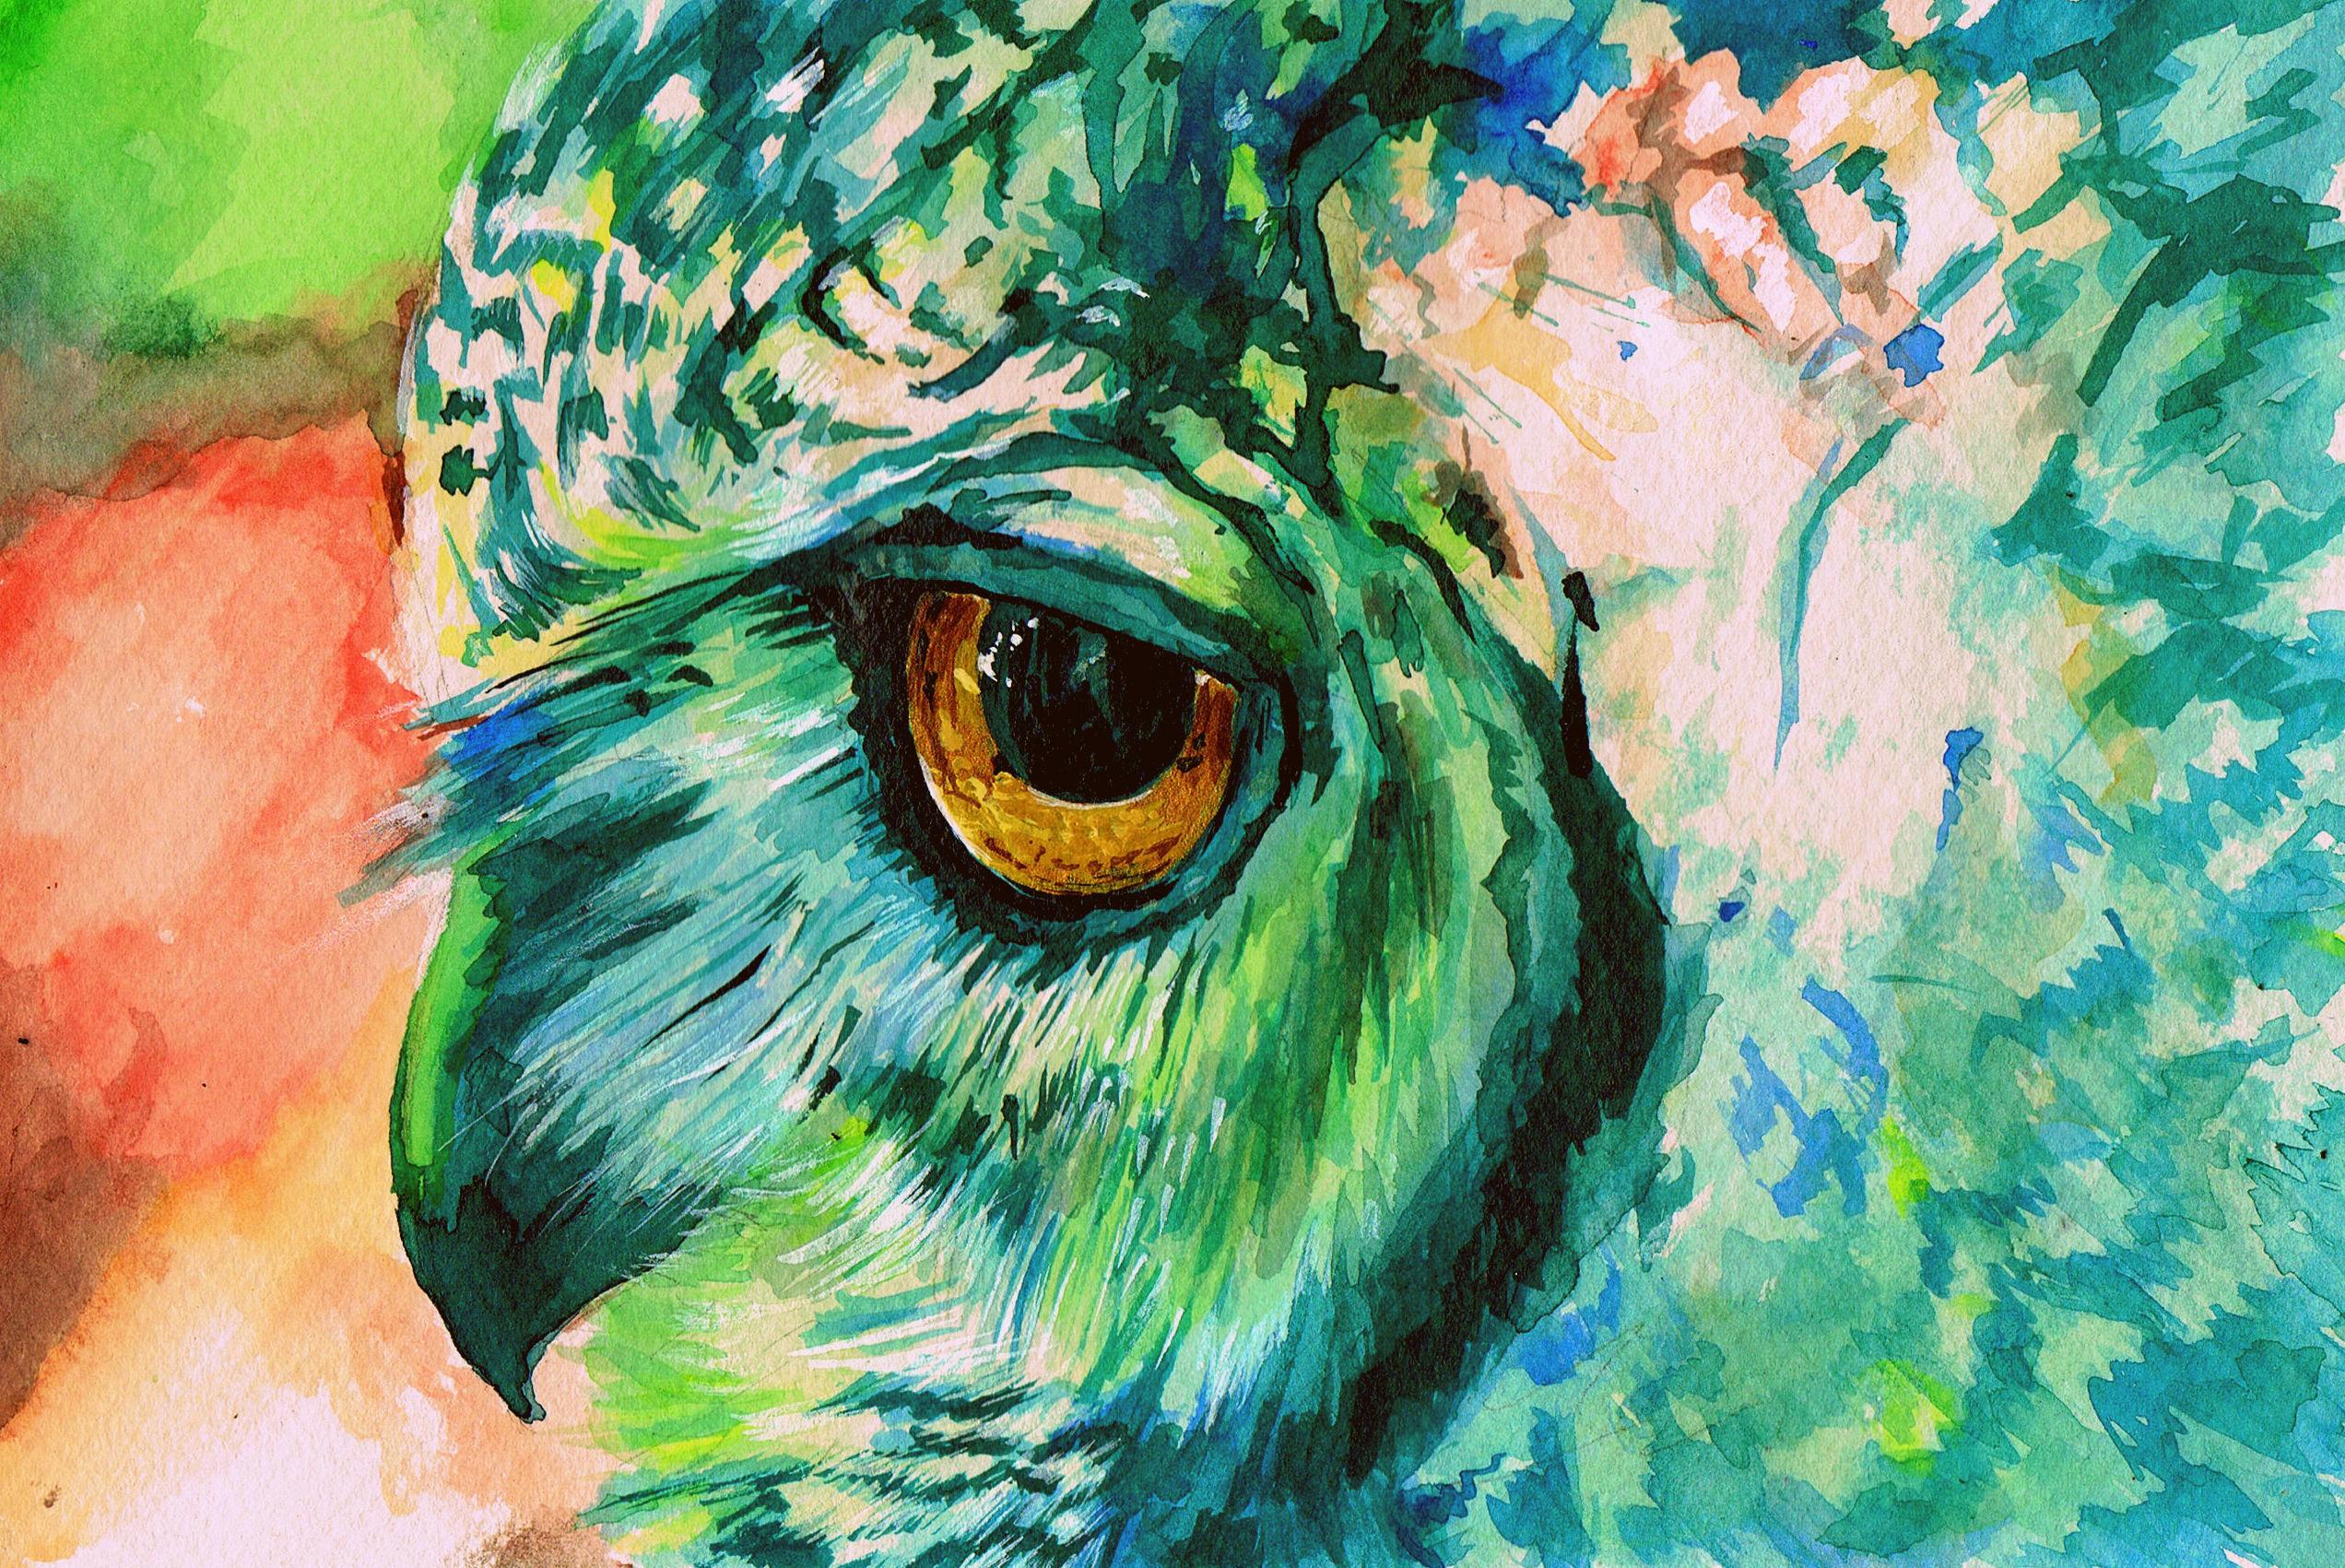 Owl HD Wallpaper | Background Image | 2544x1701 | ID ...  Owl HD Wallpape...